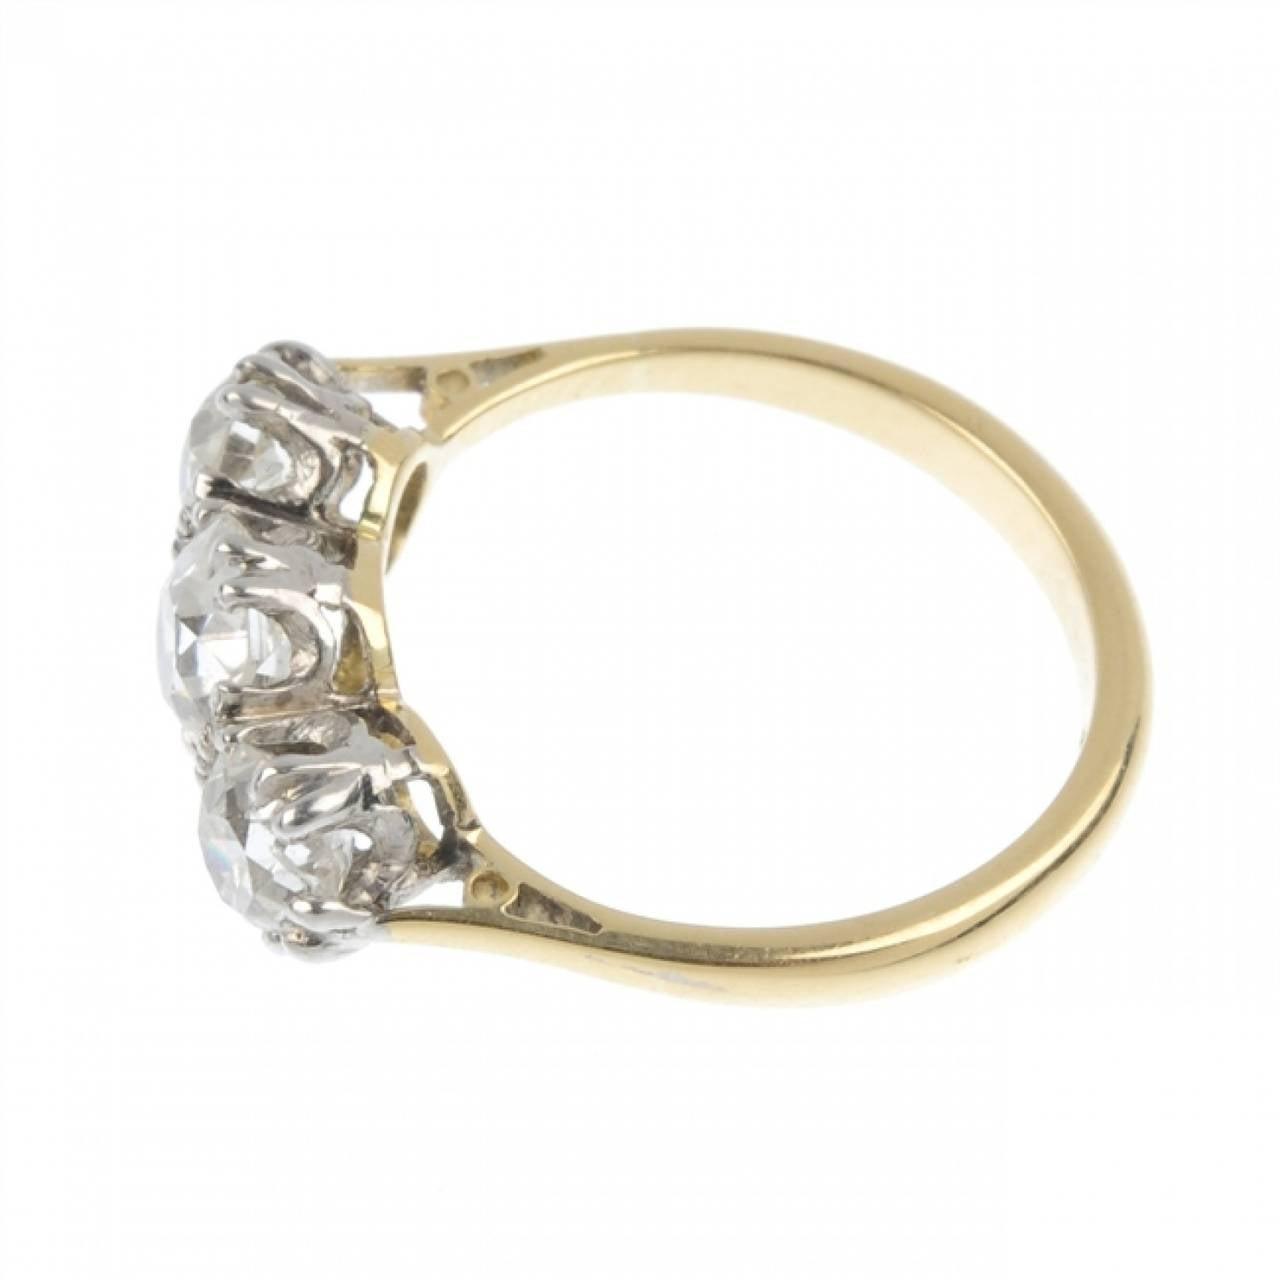 1 75 Carats Three Stone Diamond Gold Engagement Ring at 1stdibs